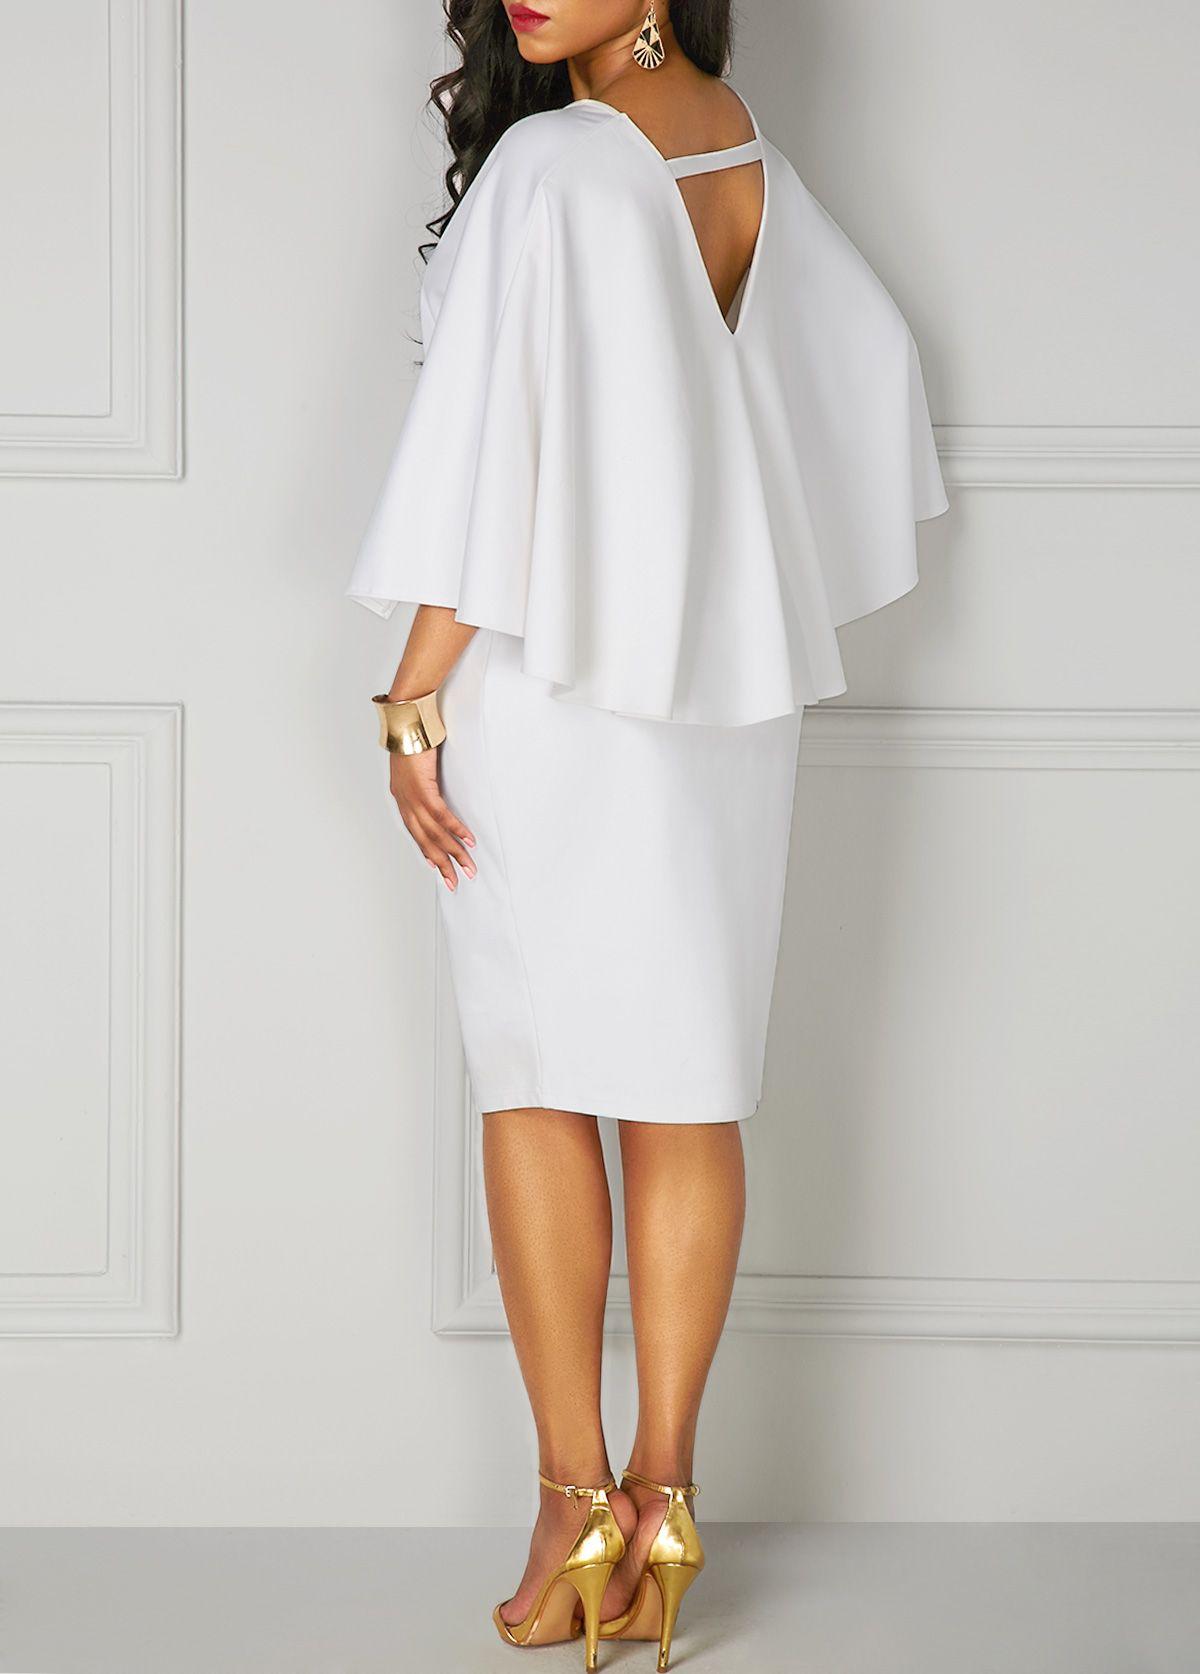 Cheap batwing dress